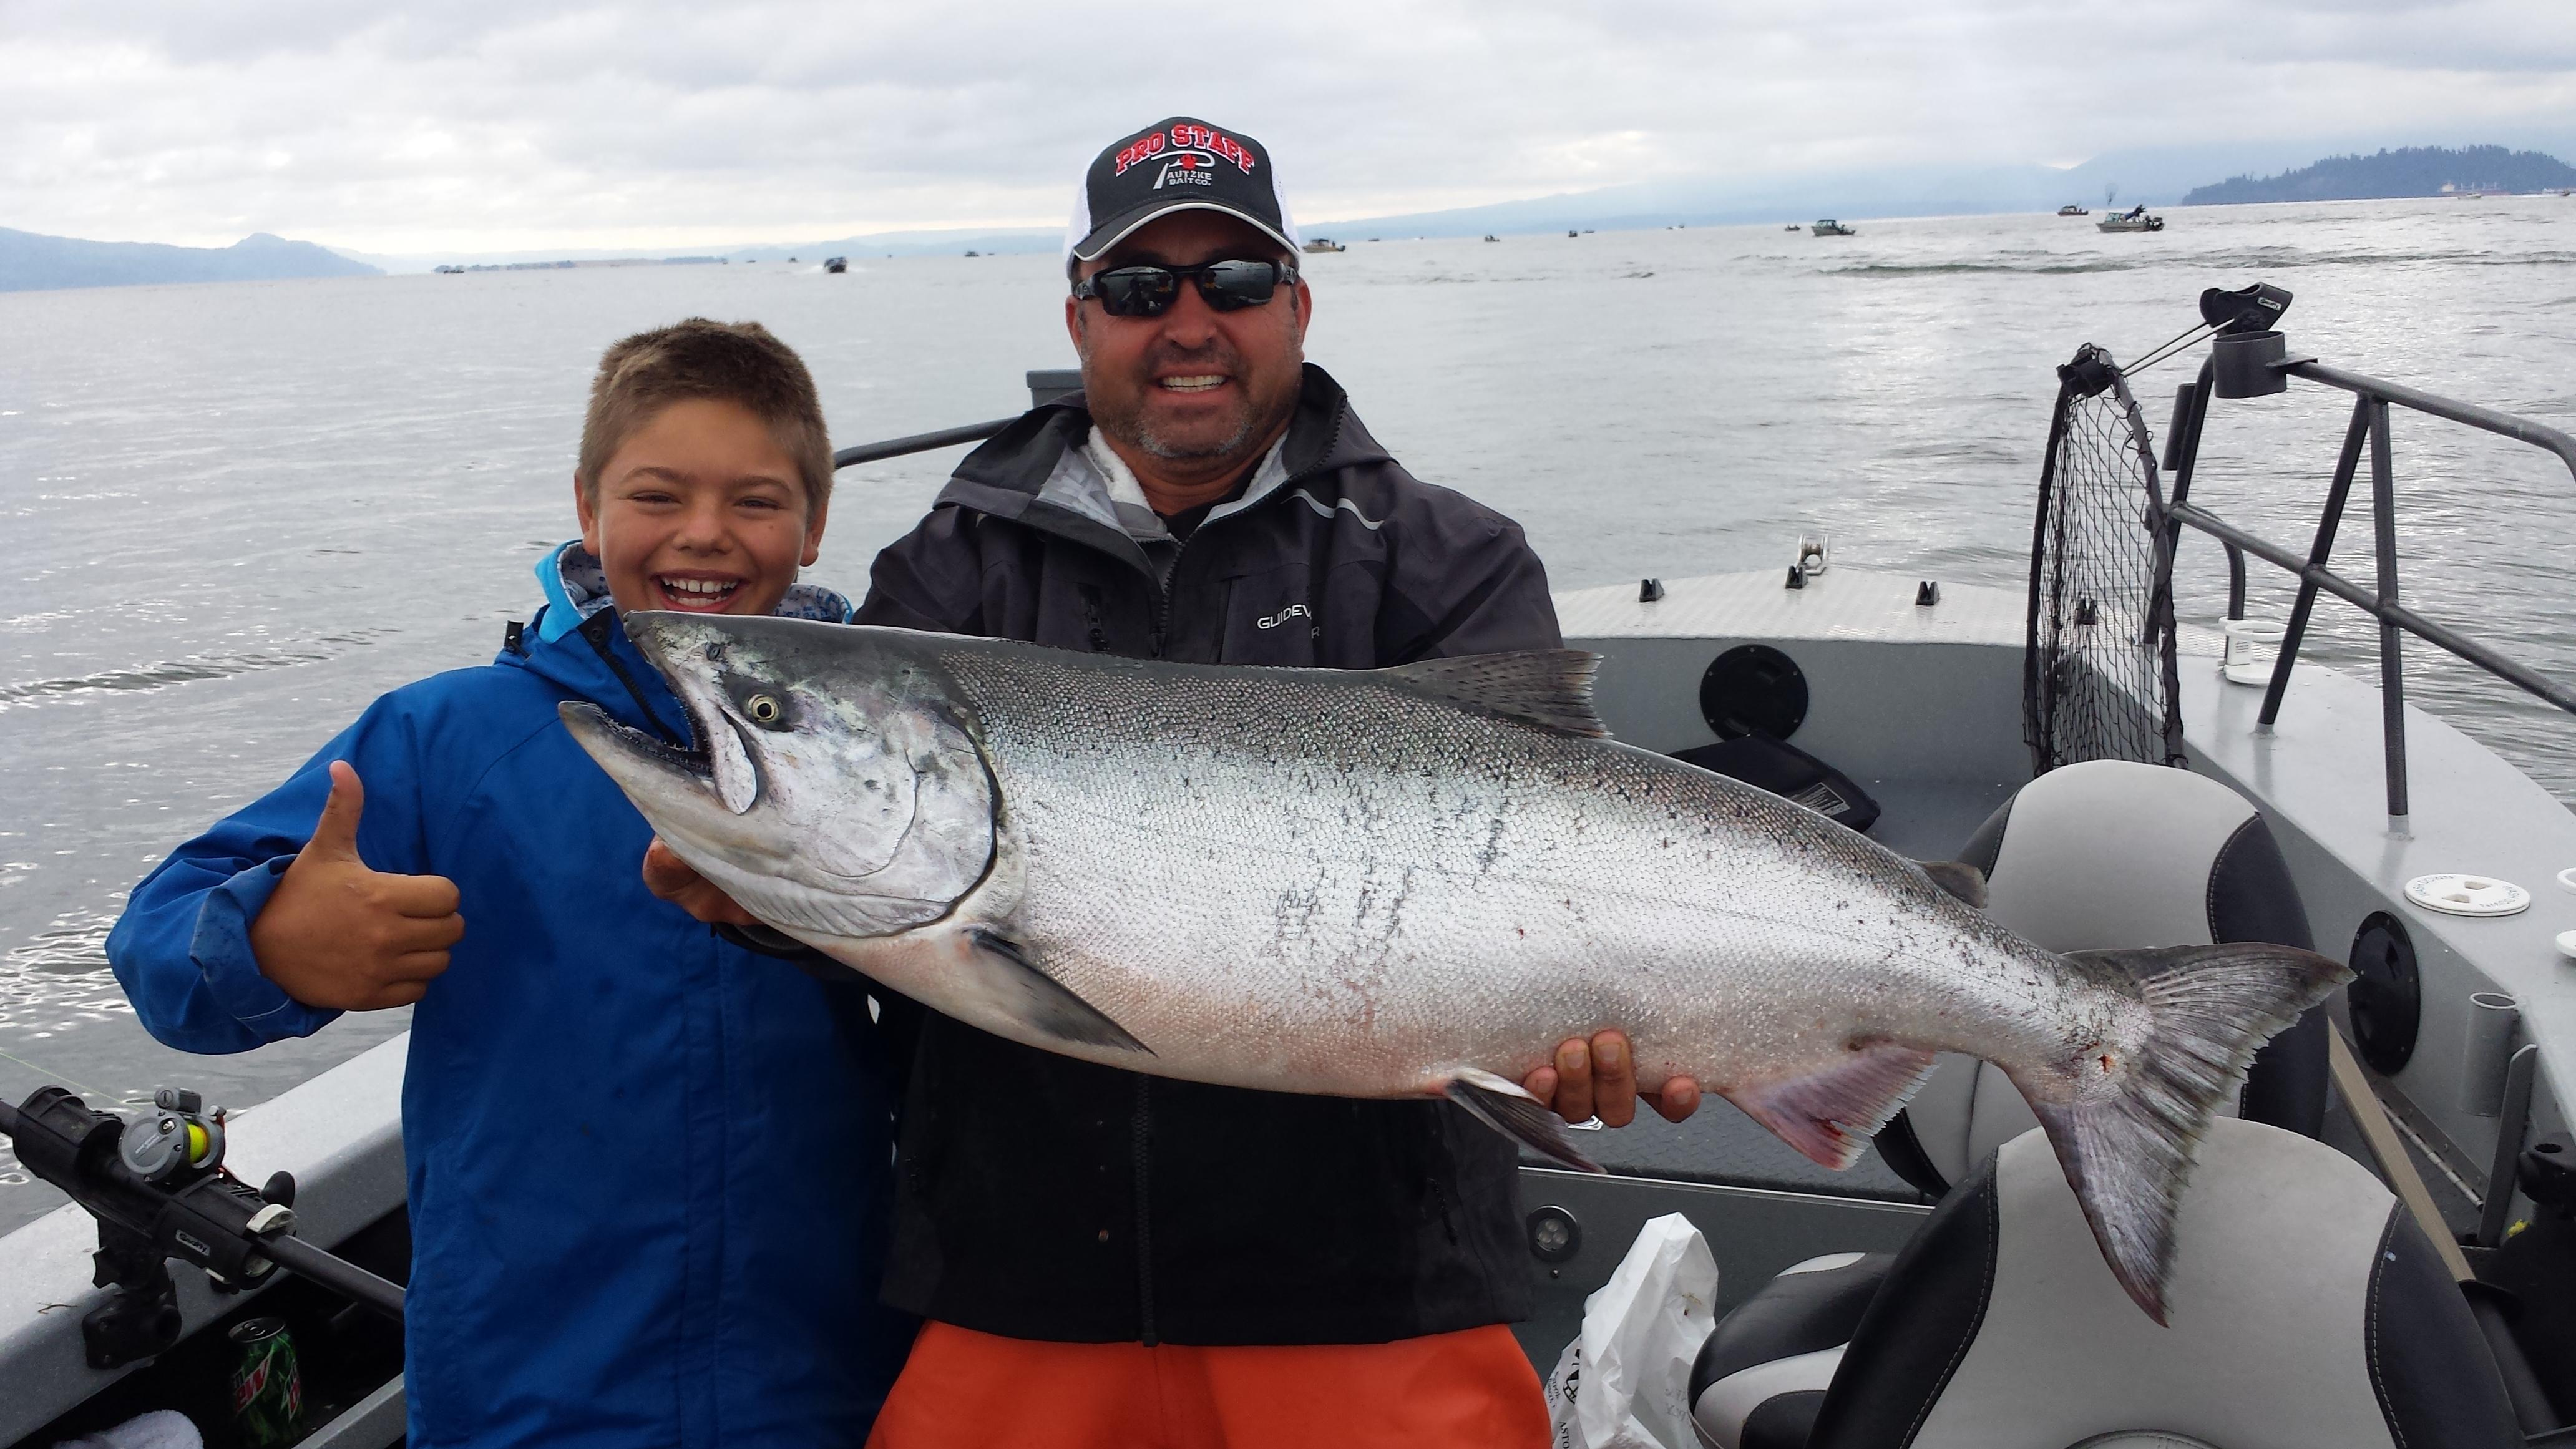 Columbia river astoria fishing guides reel time fishing for Columbia river fishing guides